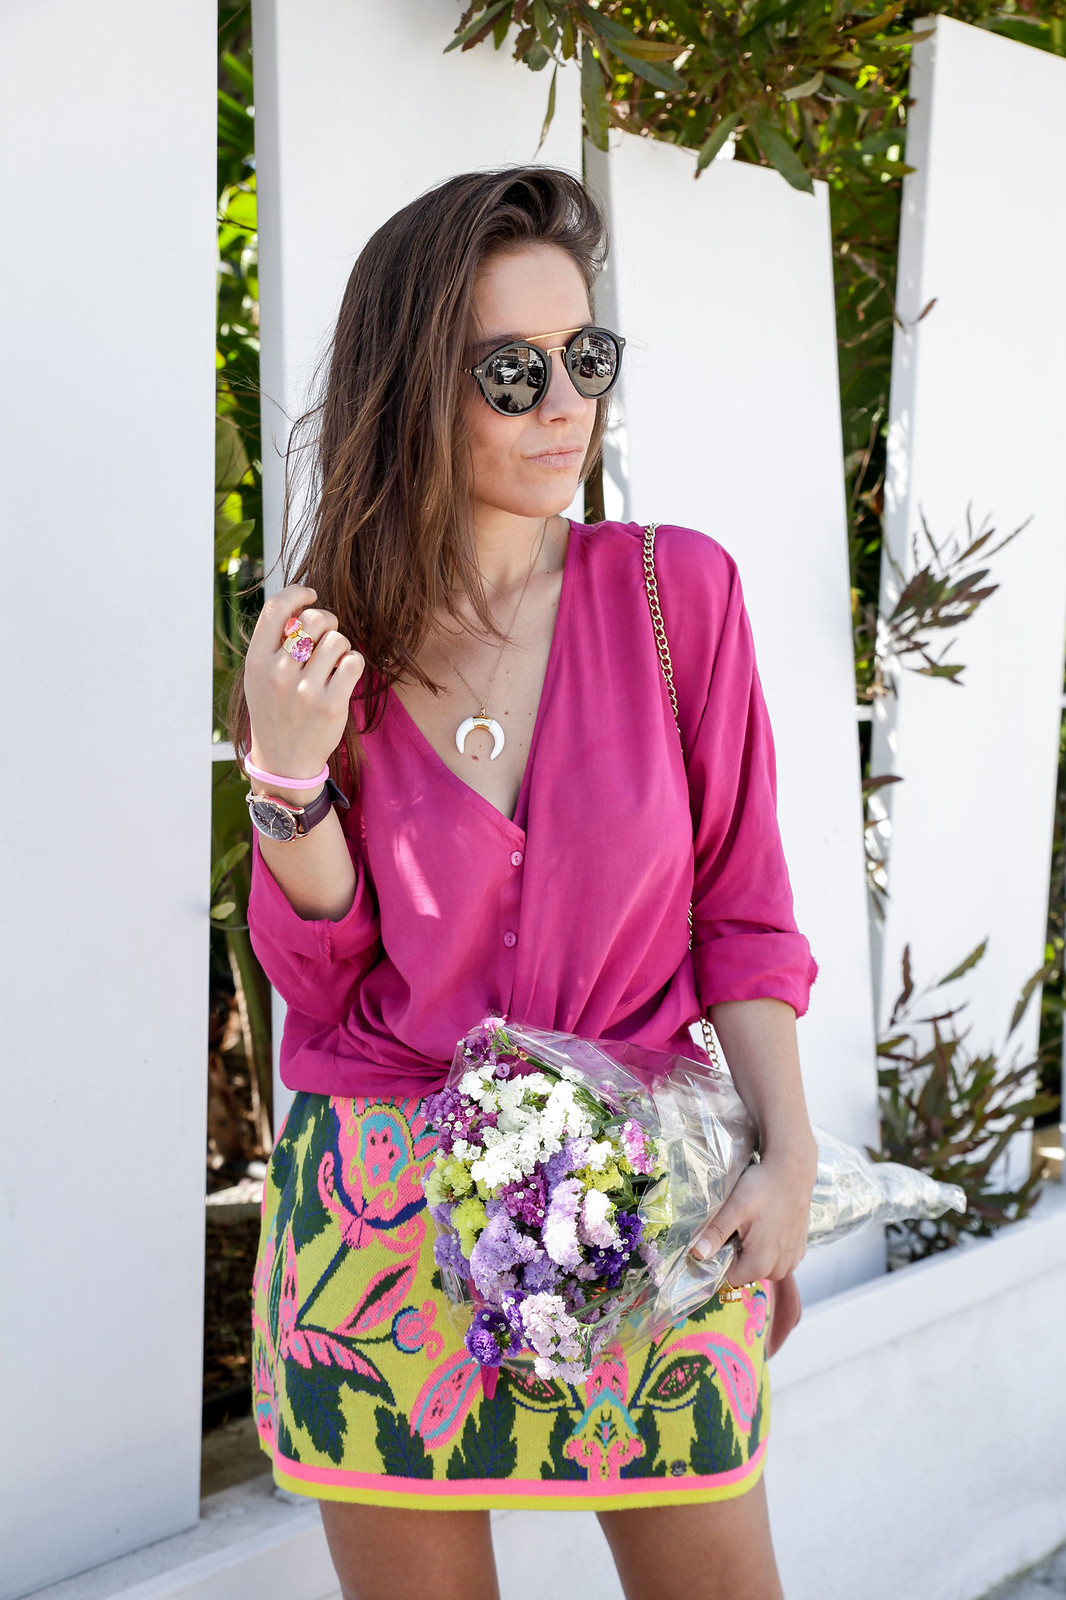 014_blusa_magenta_falda_amarilla_outfit_ruga_summer17_theguestgirl_influencer_barcelona_portugal_brand_ambassador